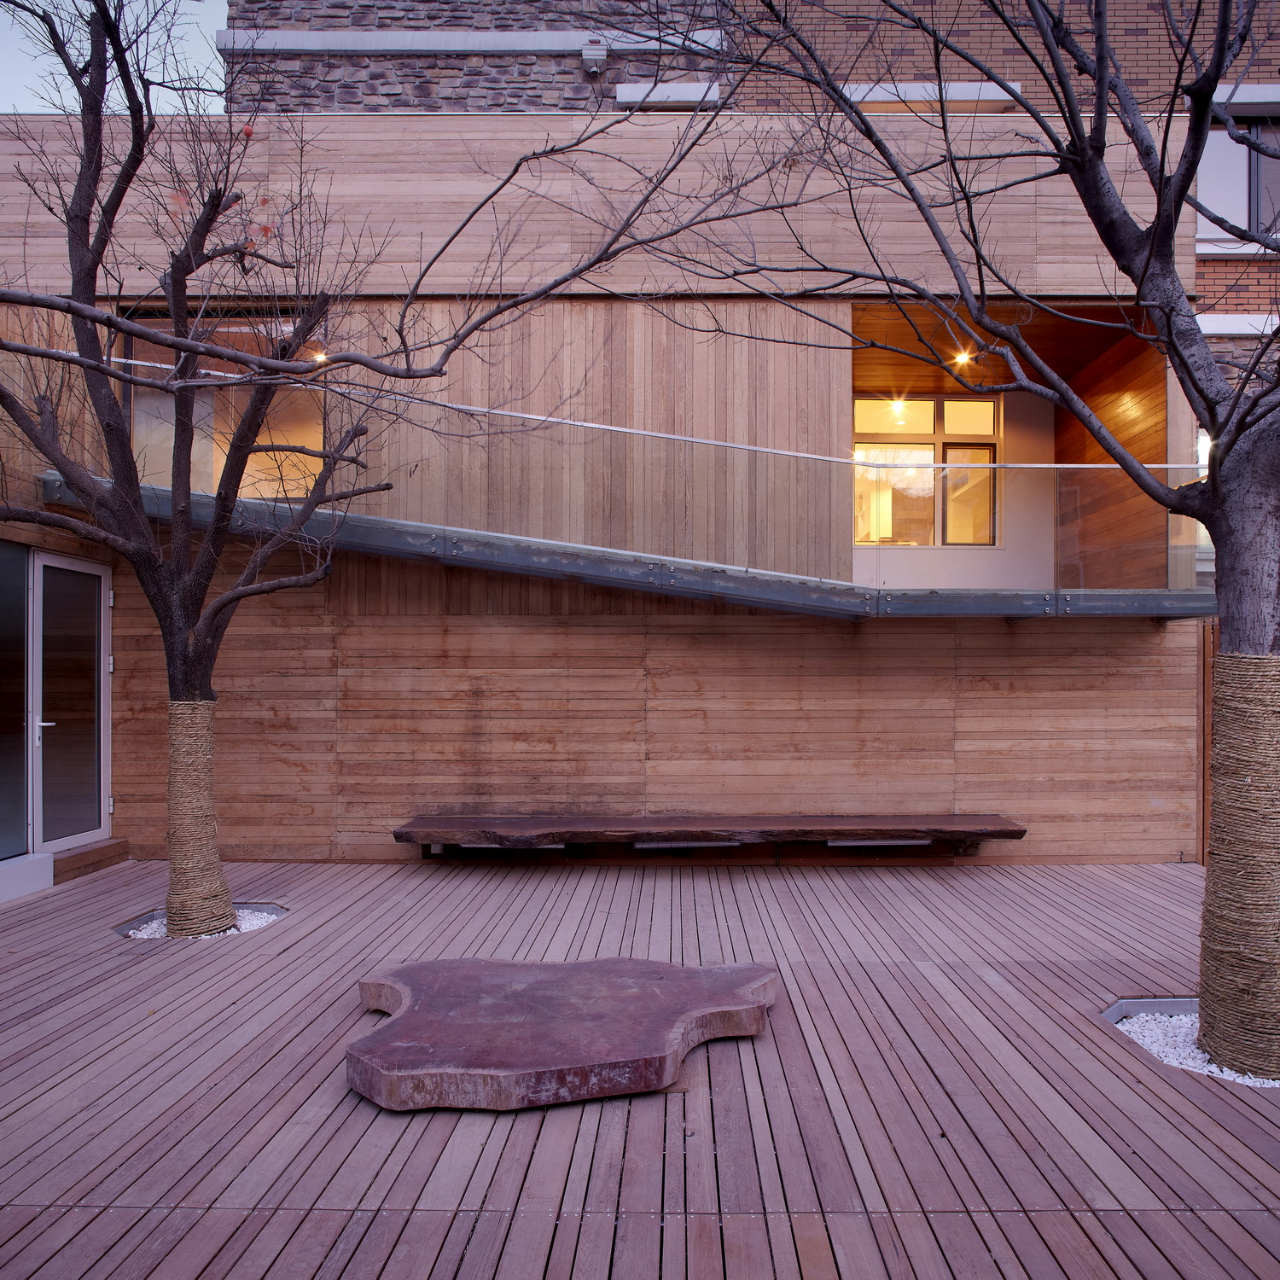 Meng House / Tao Lei, © Tao Lei